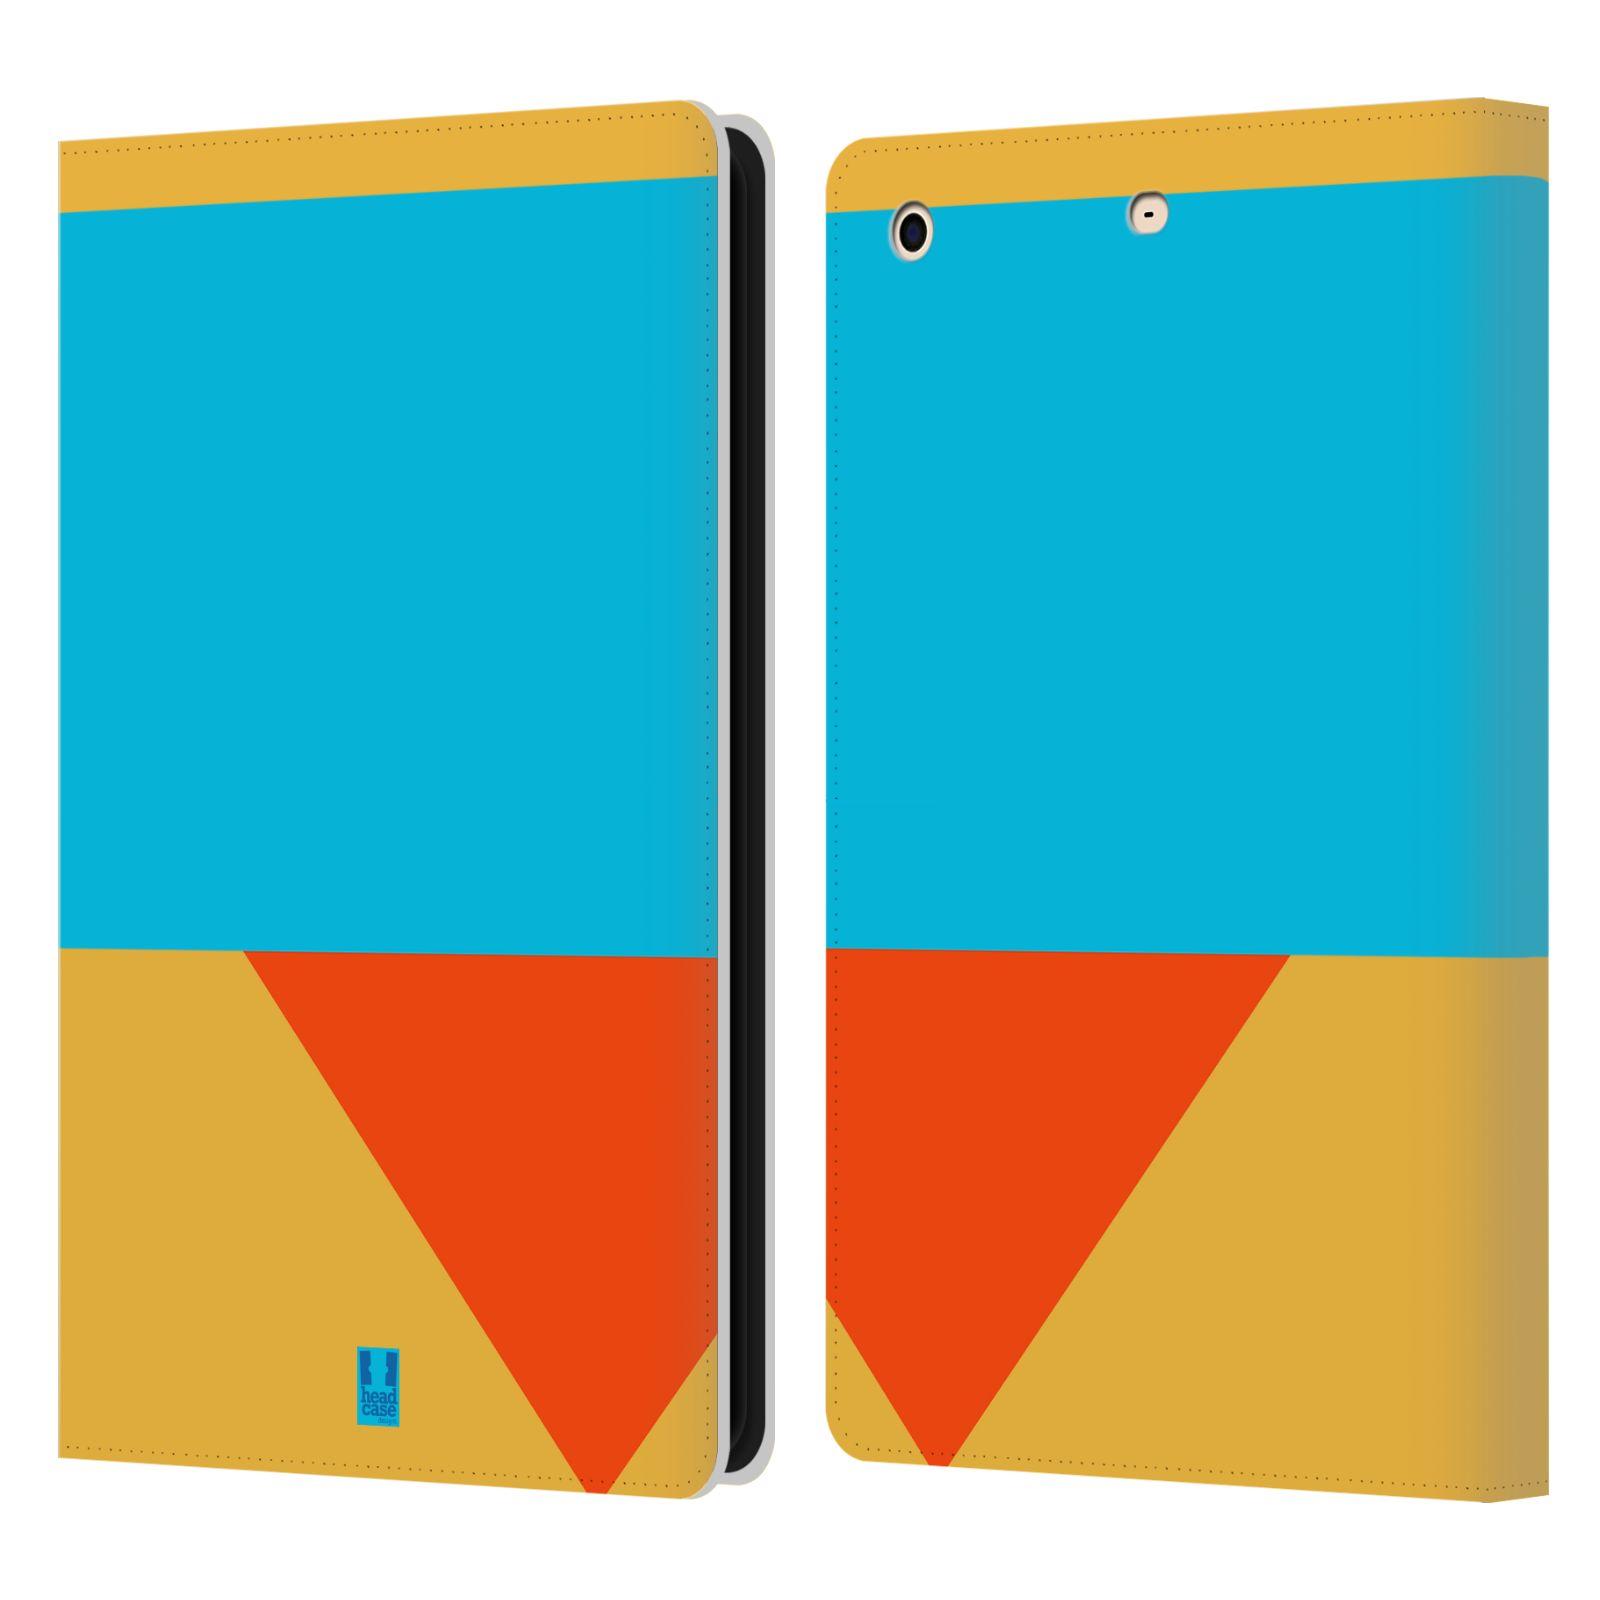 HEAD CASE Flipové pouzdro pro tablet Apple iPad mini barevné tvary béžová a modrá DAY WEAR